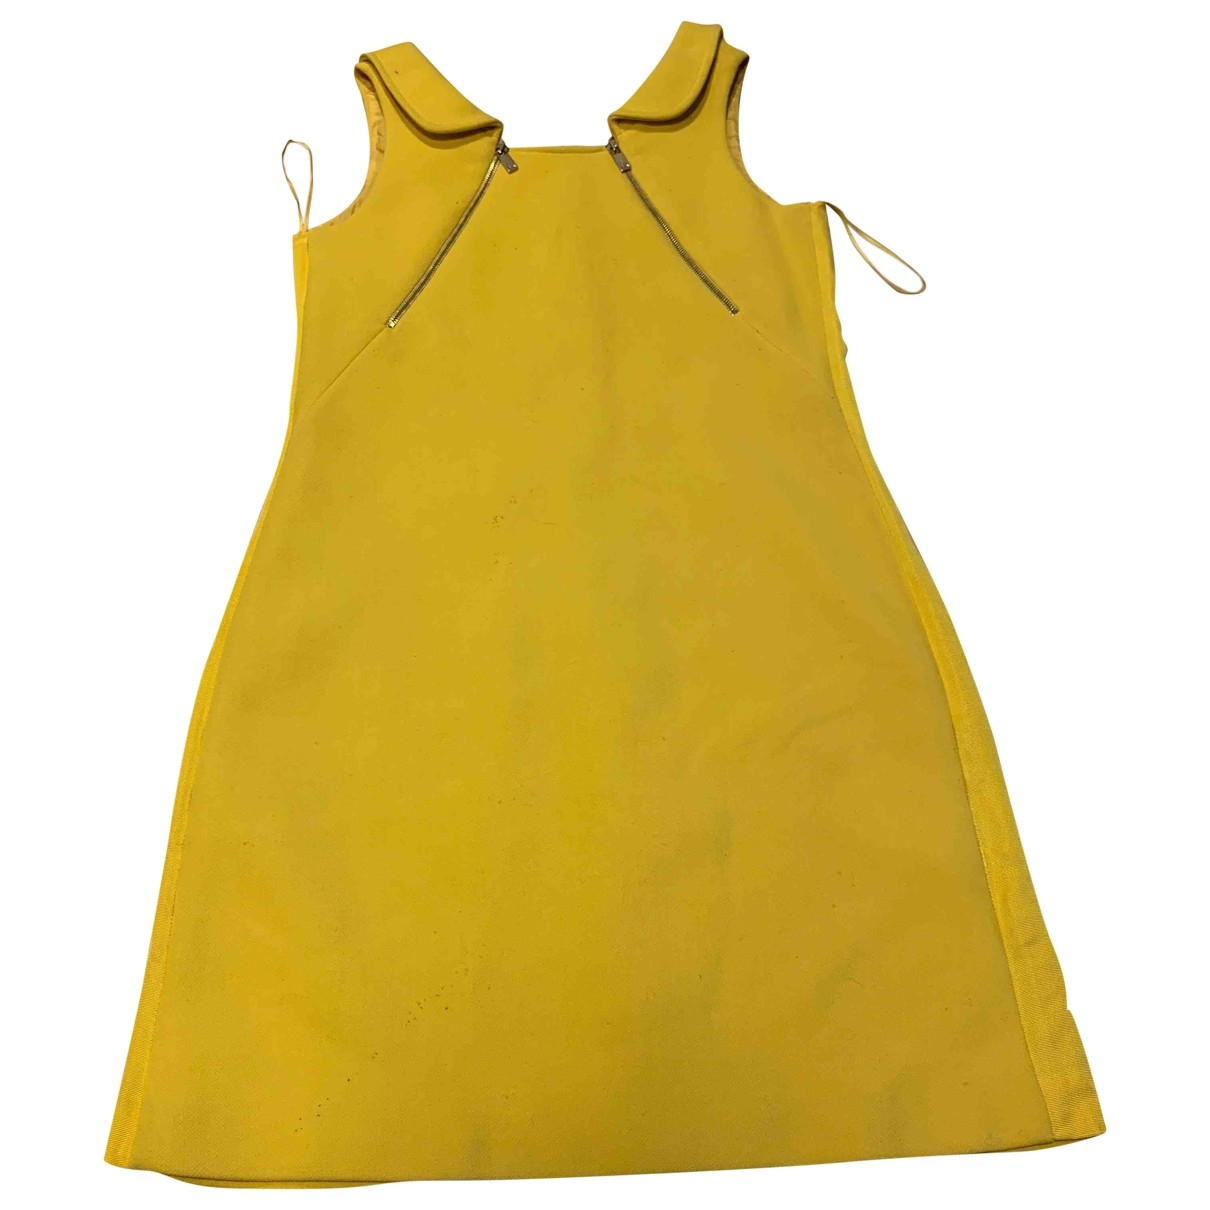 Michael Kors \N Yellow Wool dress for Women 8 US